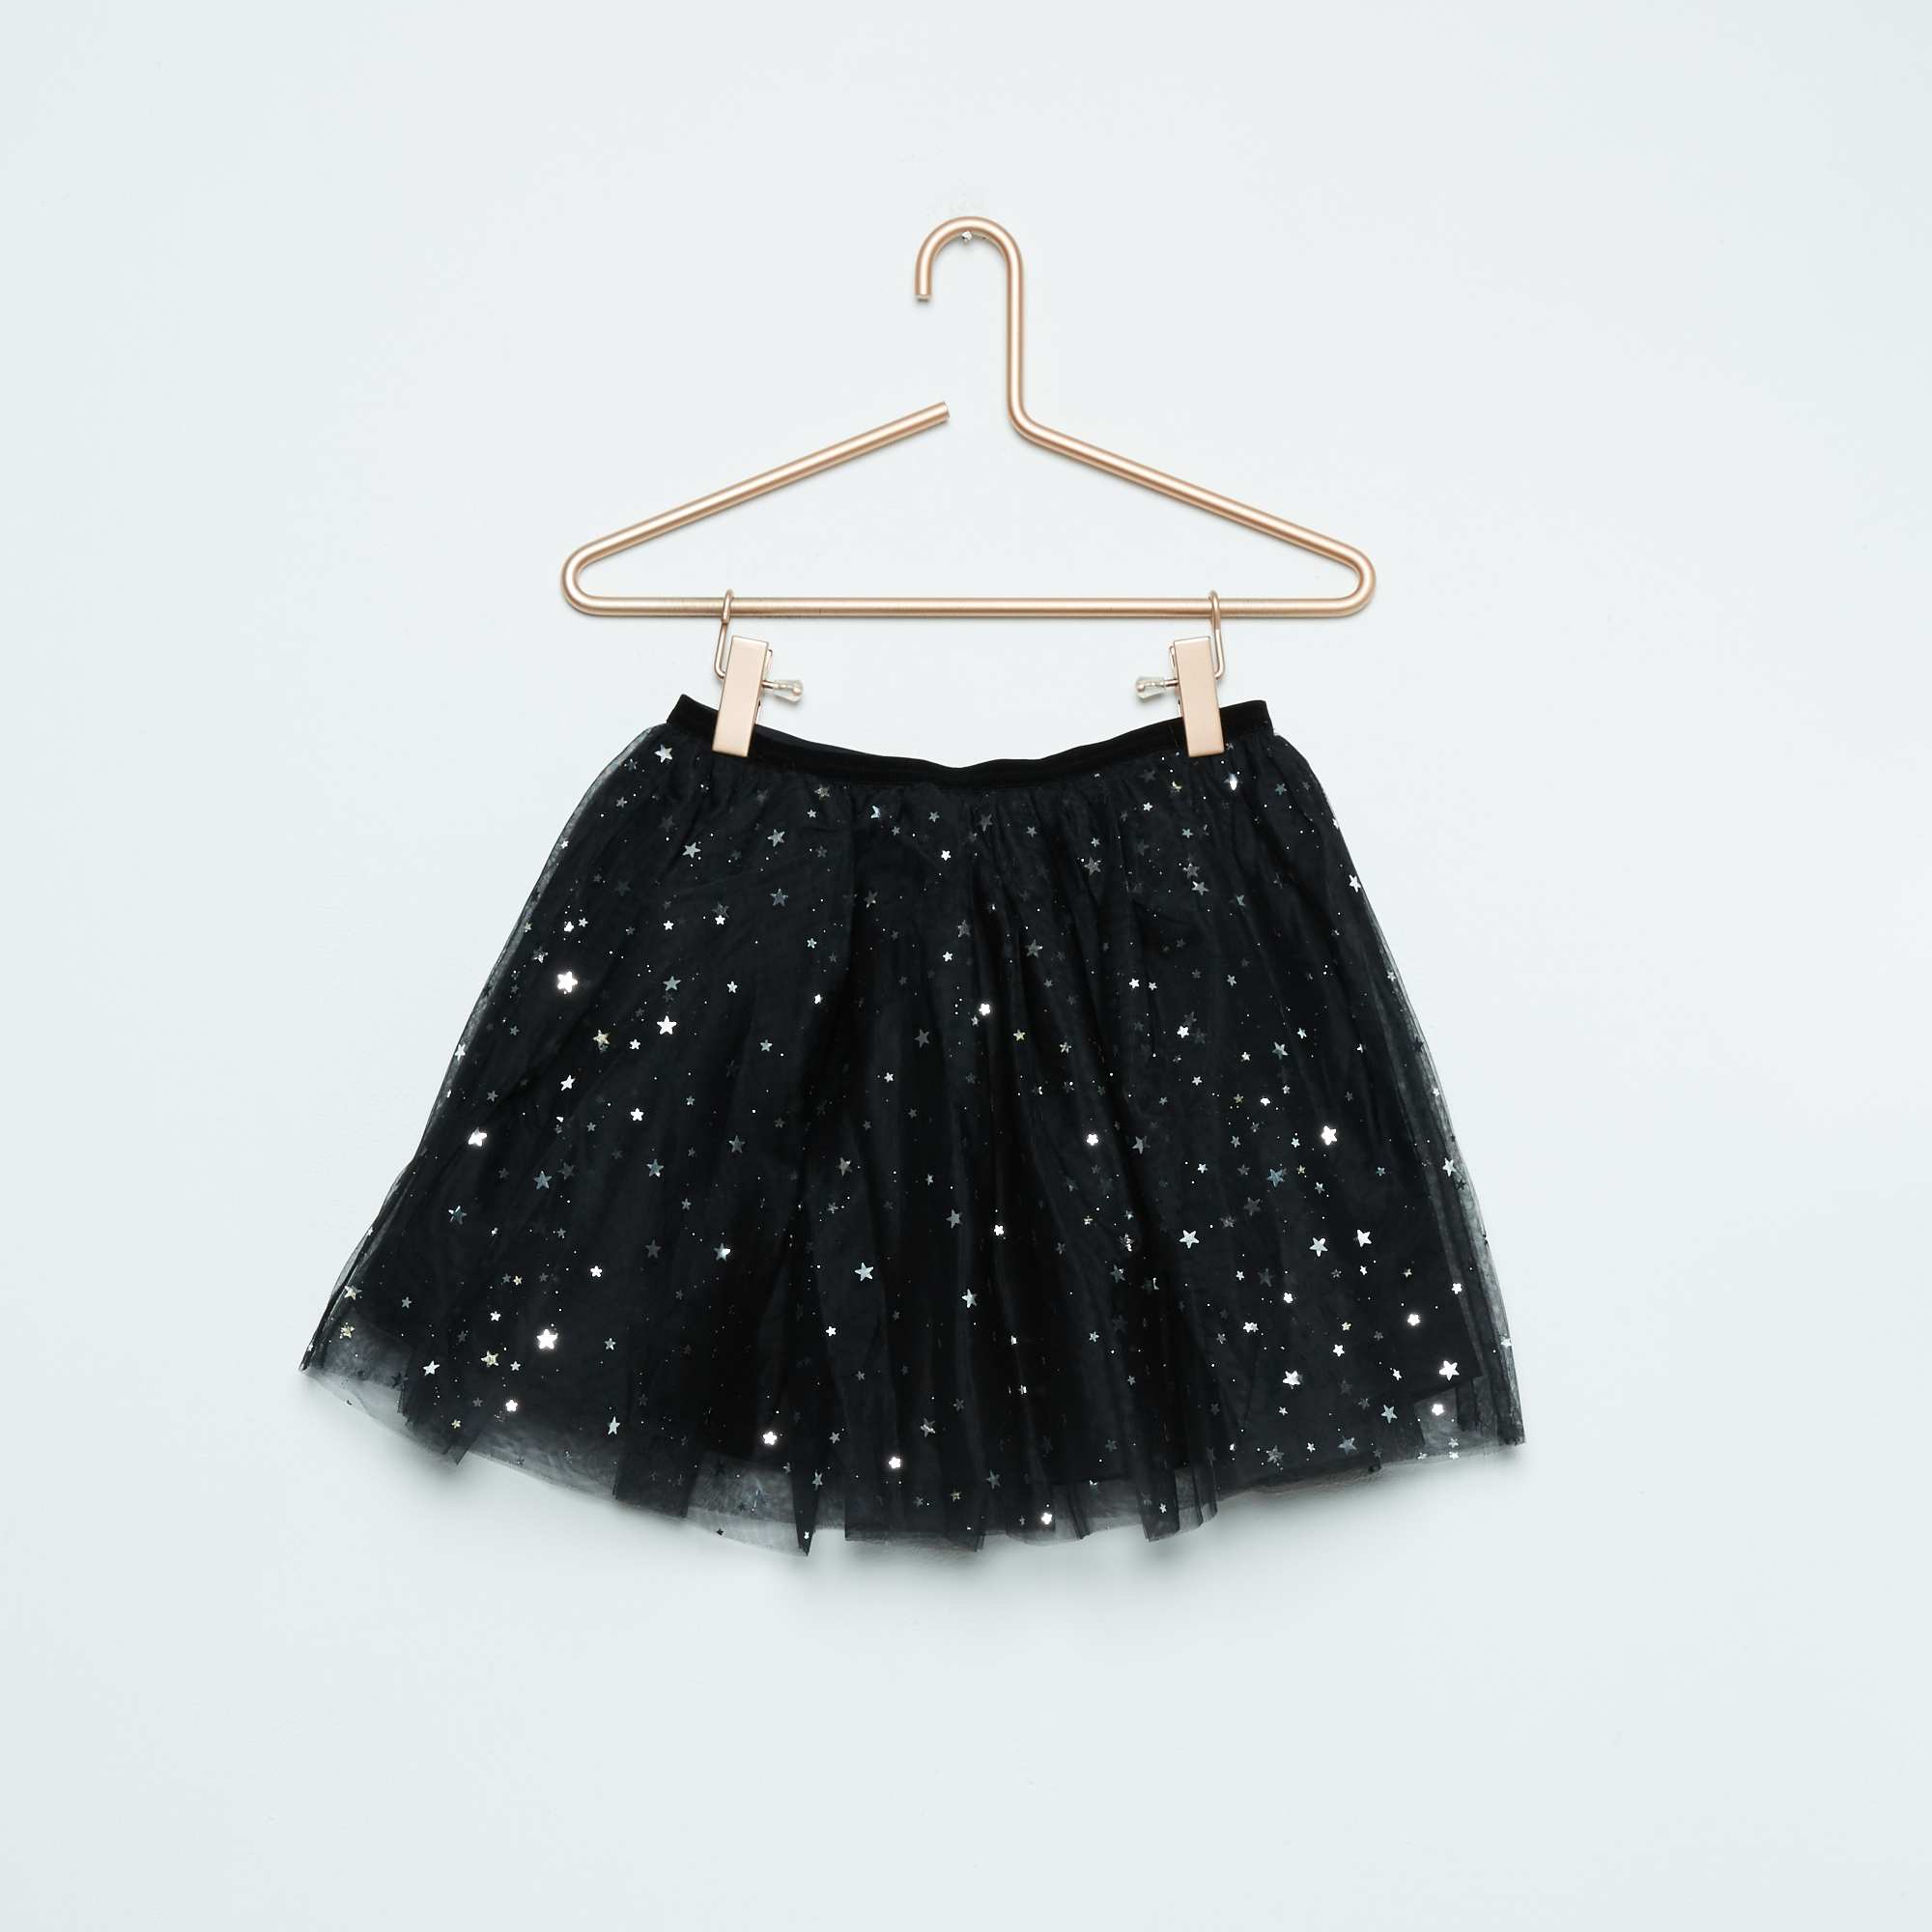 jupe tutu en tulle avec motifs brillants fille noir kiabi 4 50. Black Bedroom Furniture Sets. Home Design Ideas